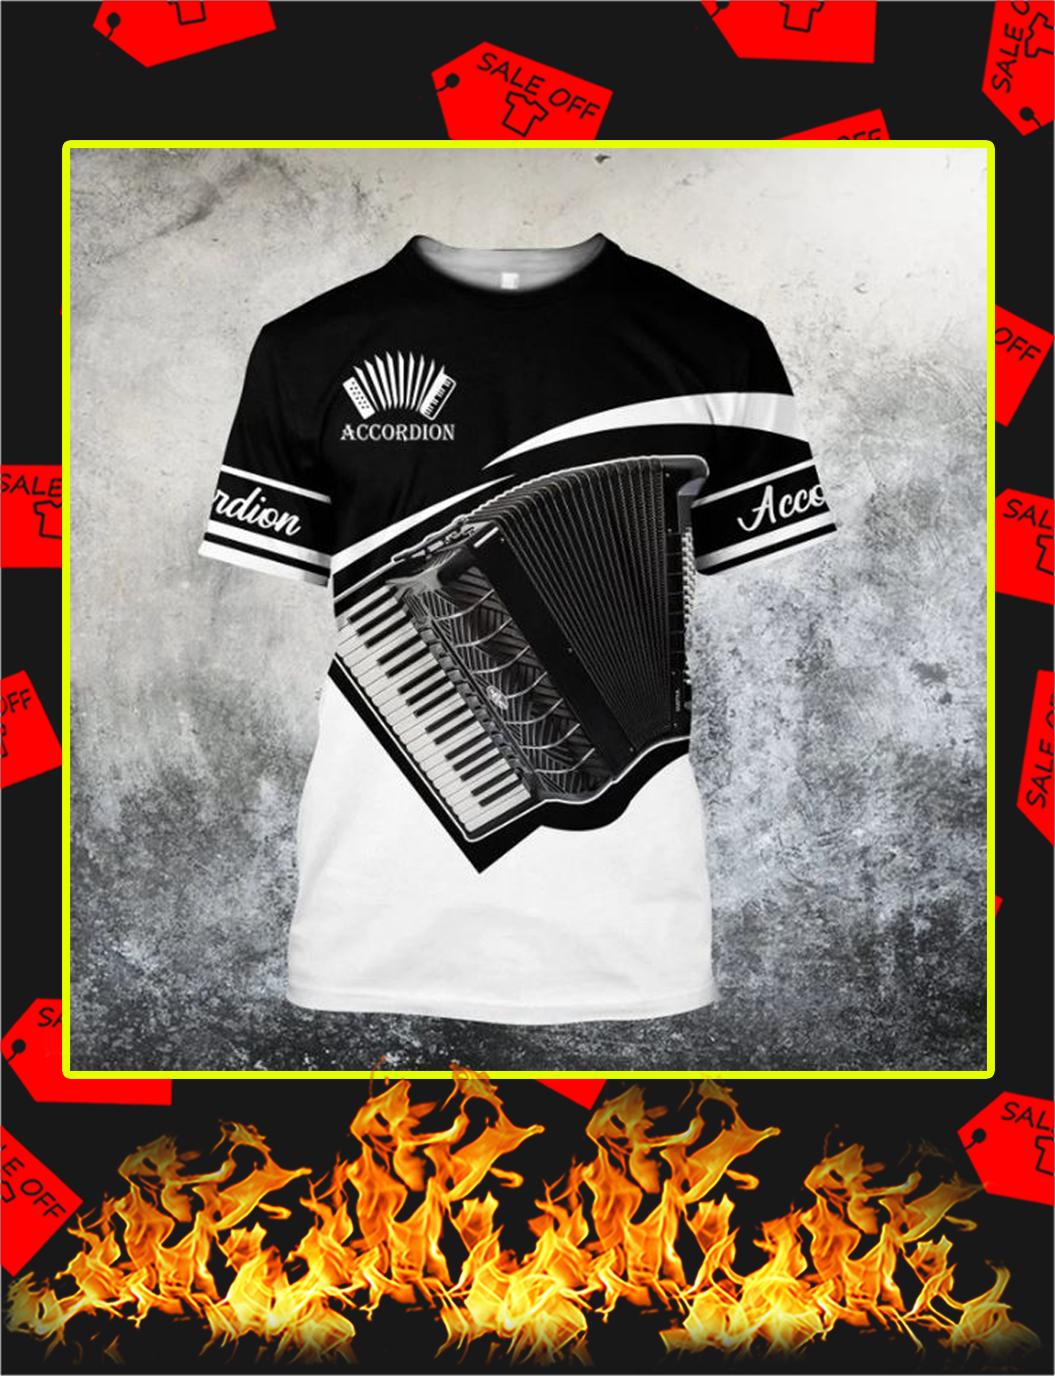 Accordion music 3d shirt